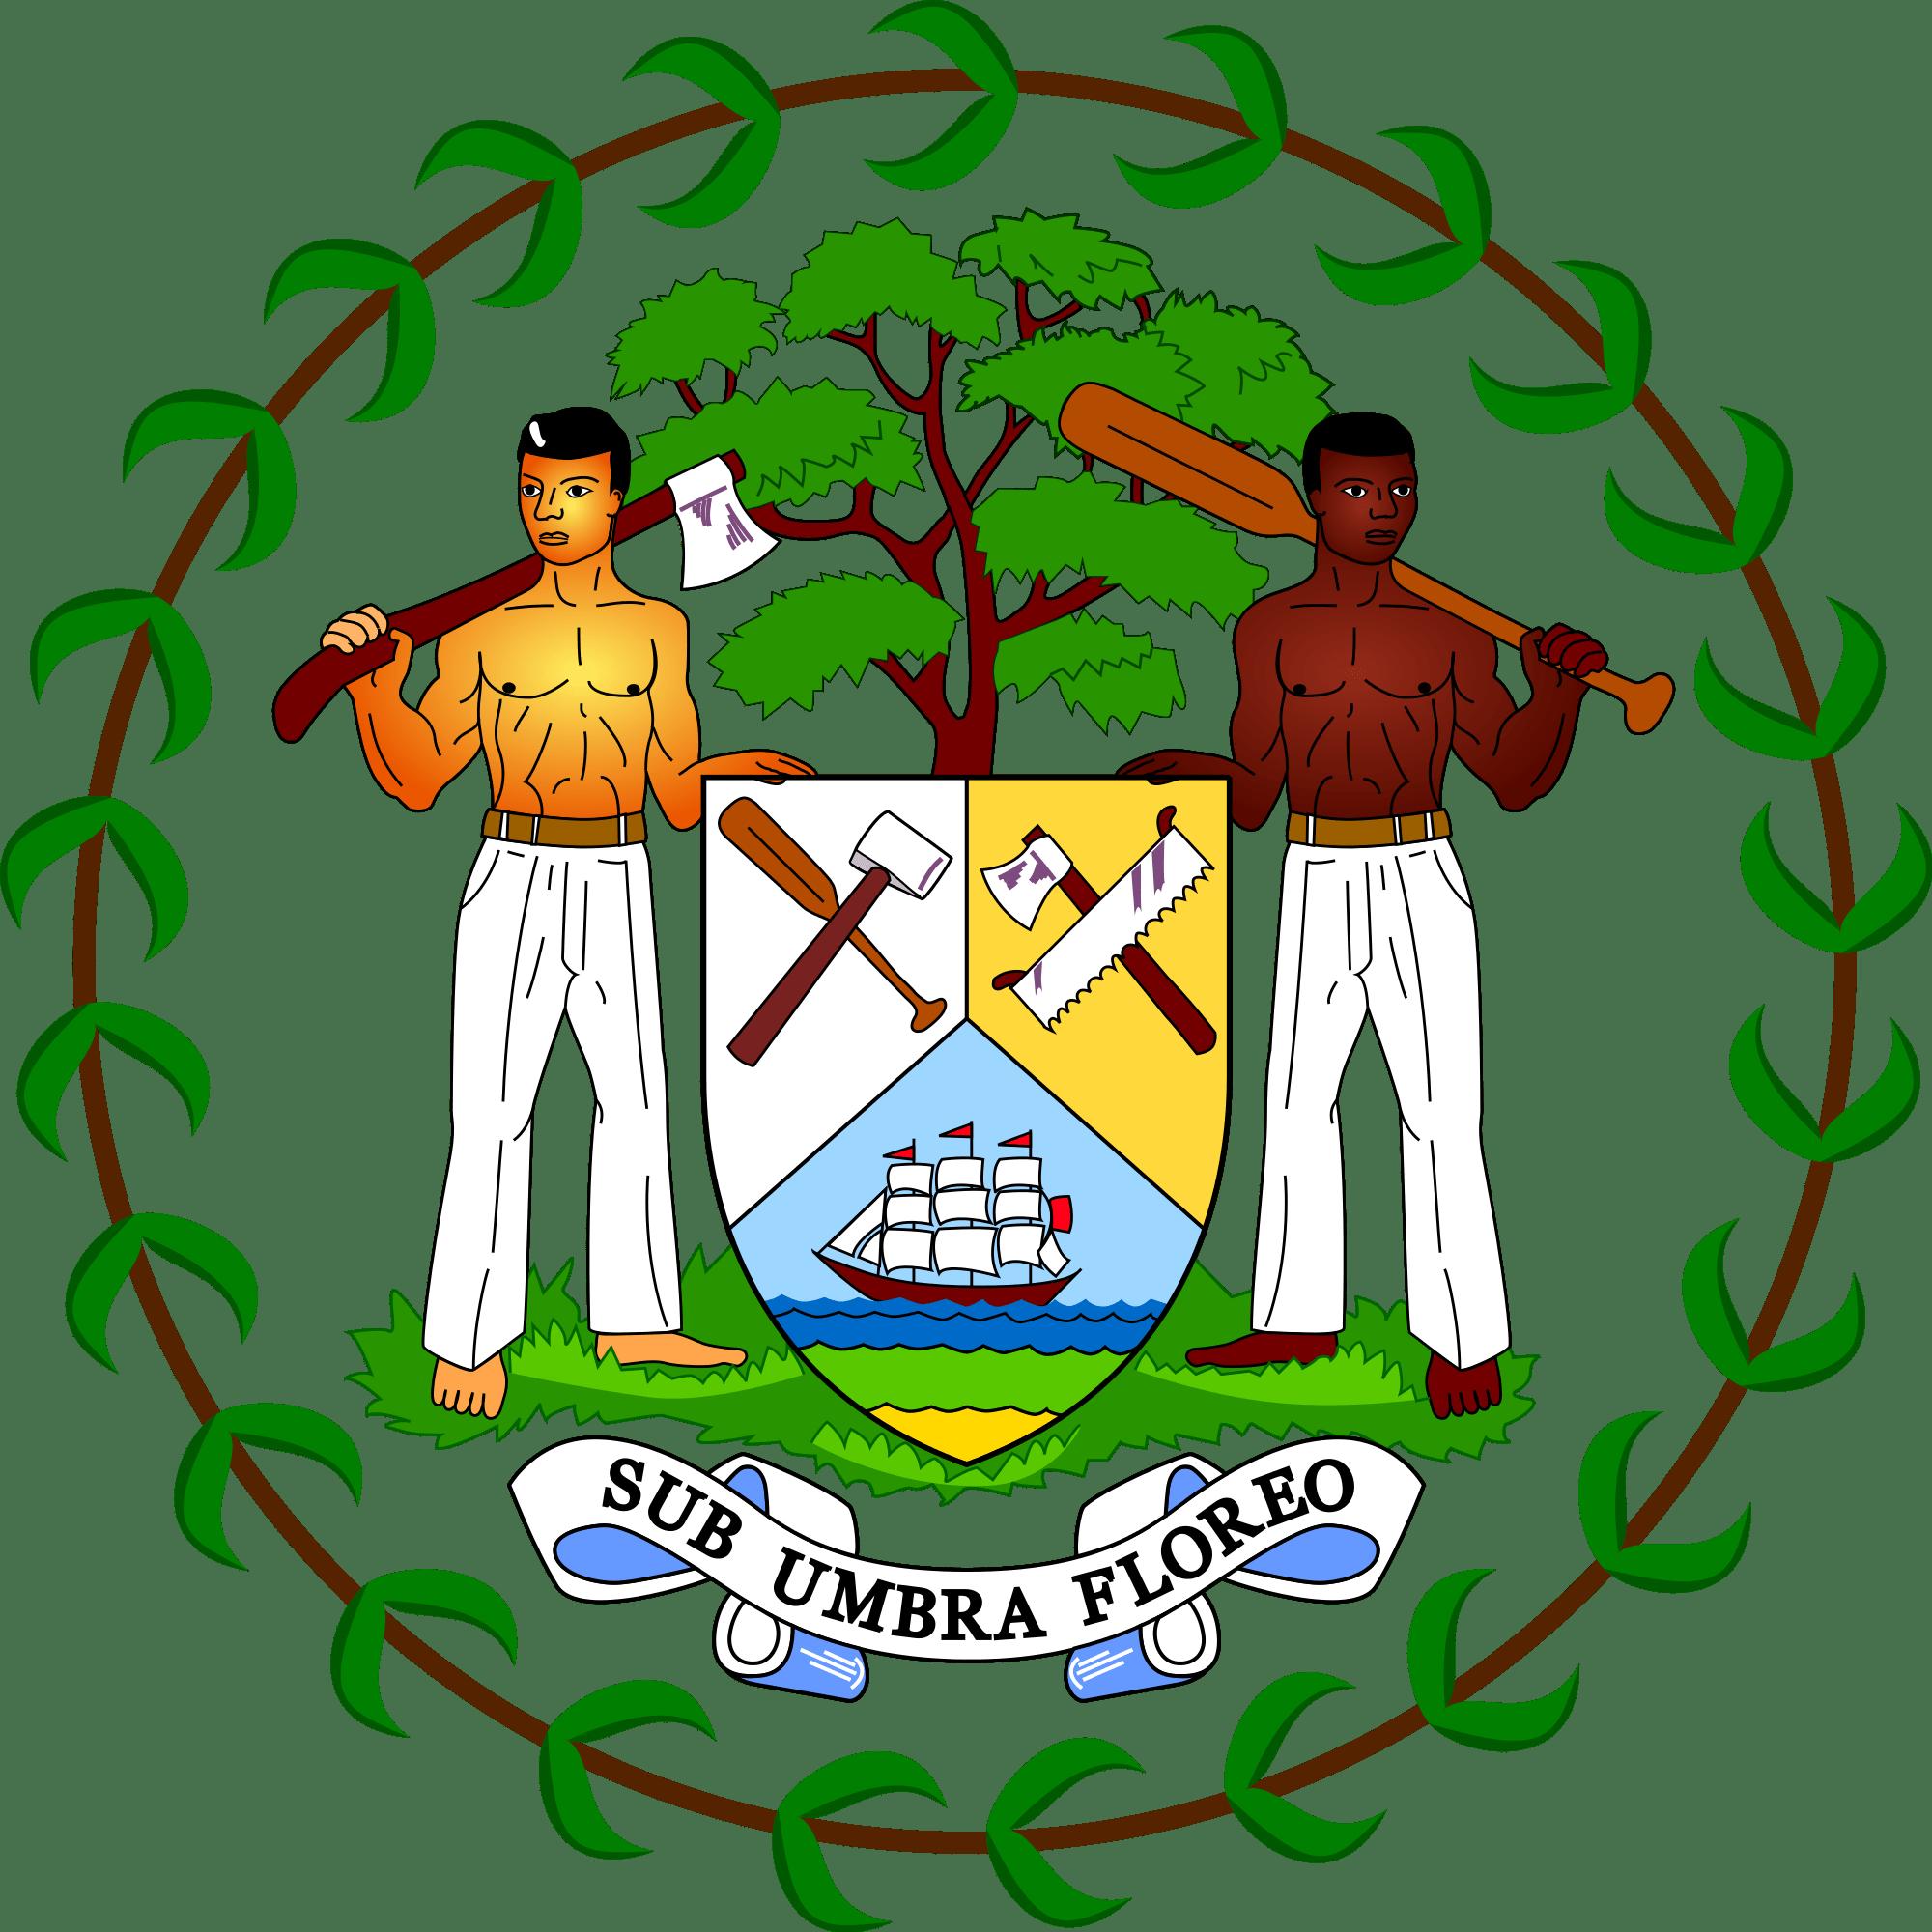 Belize National Symbols Flag Arms Flower Tree Bird Animal